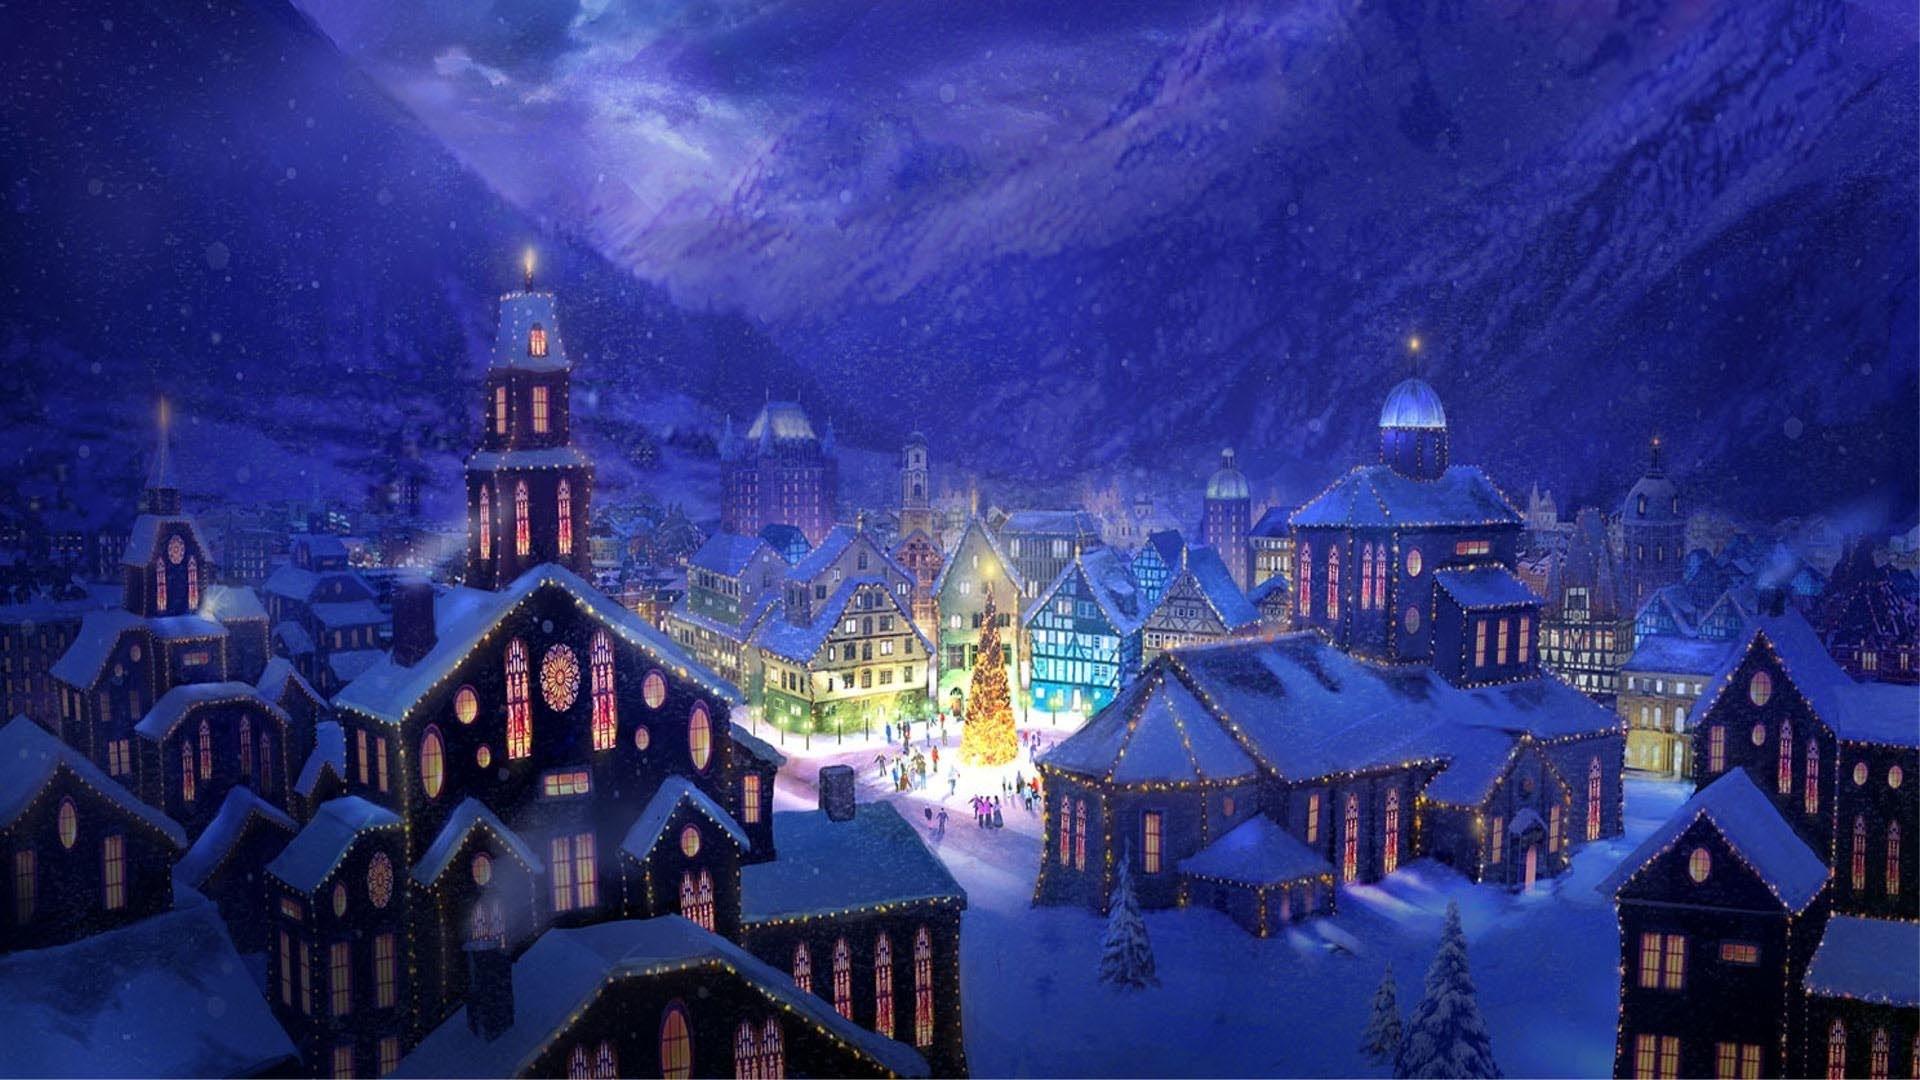 christmas landscapes | christmas village square hd wallpaper